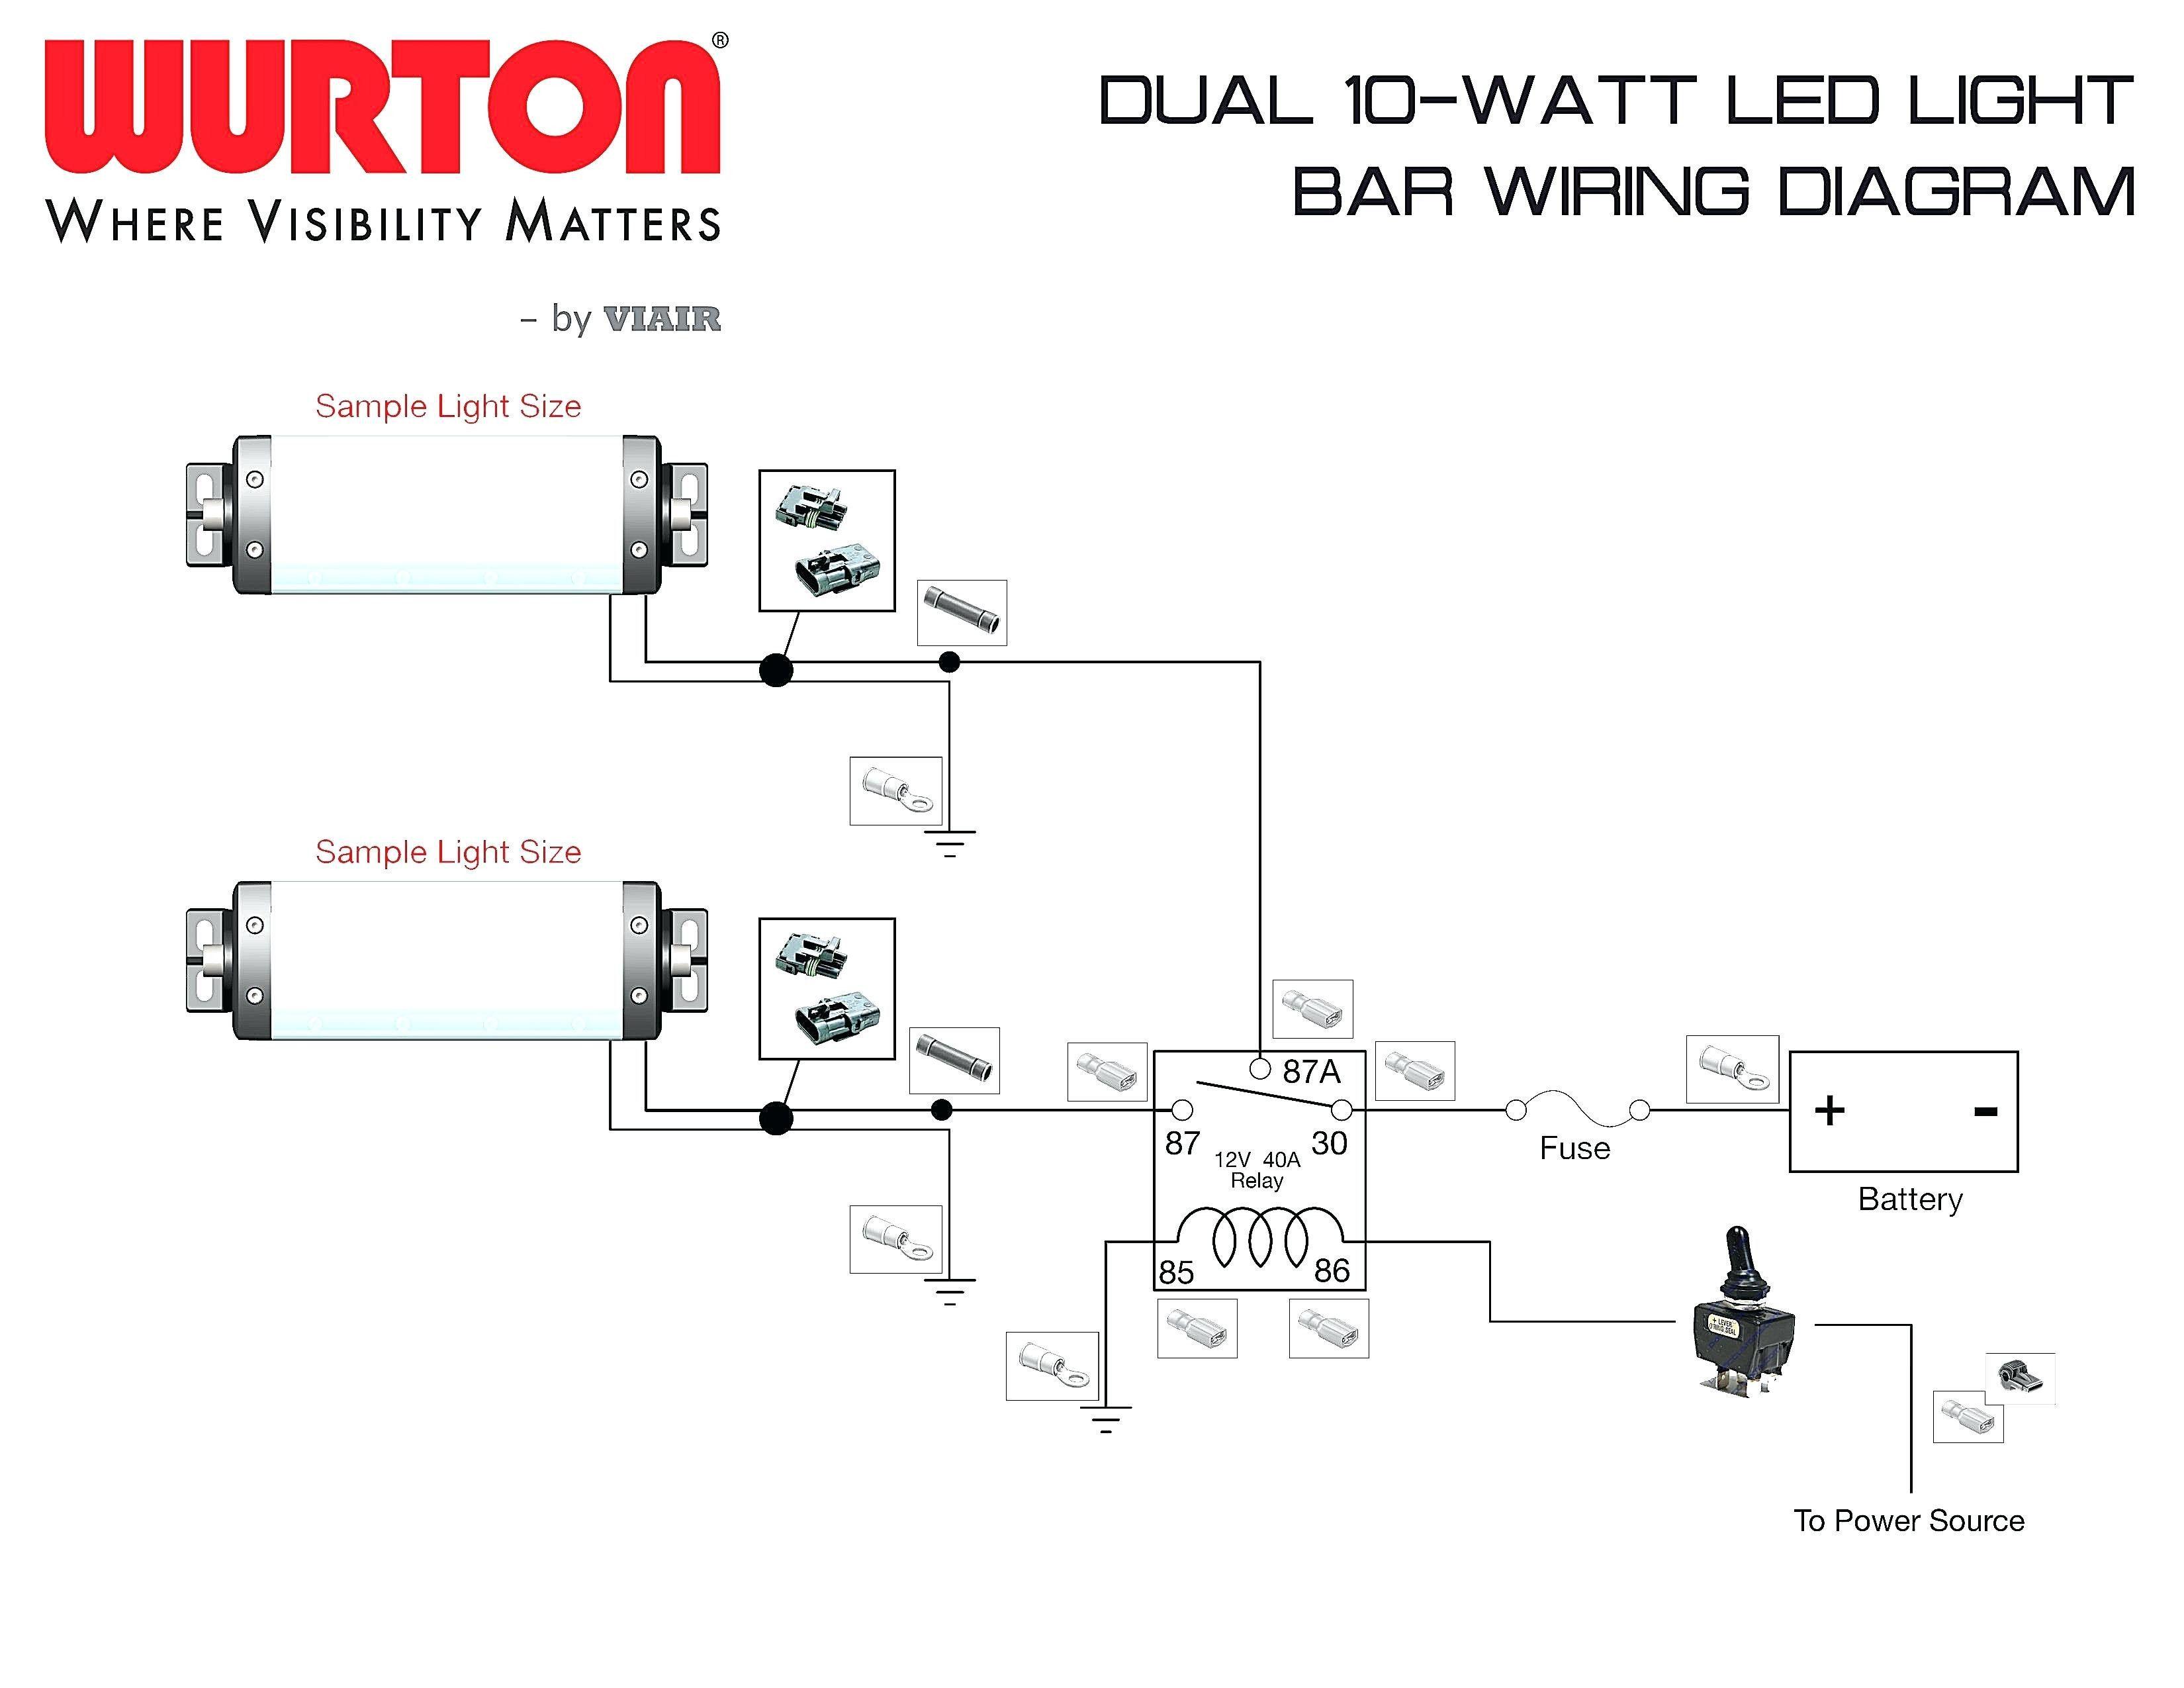 gm fuel sending unit wiring ver wiring diagram gm oil pressure switch wiring diagram on  [ 3300 x 2550 Pixel ]